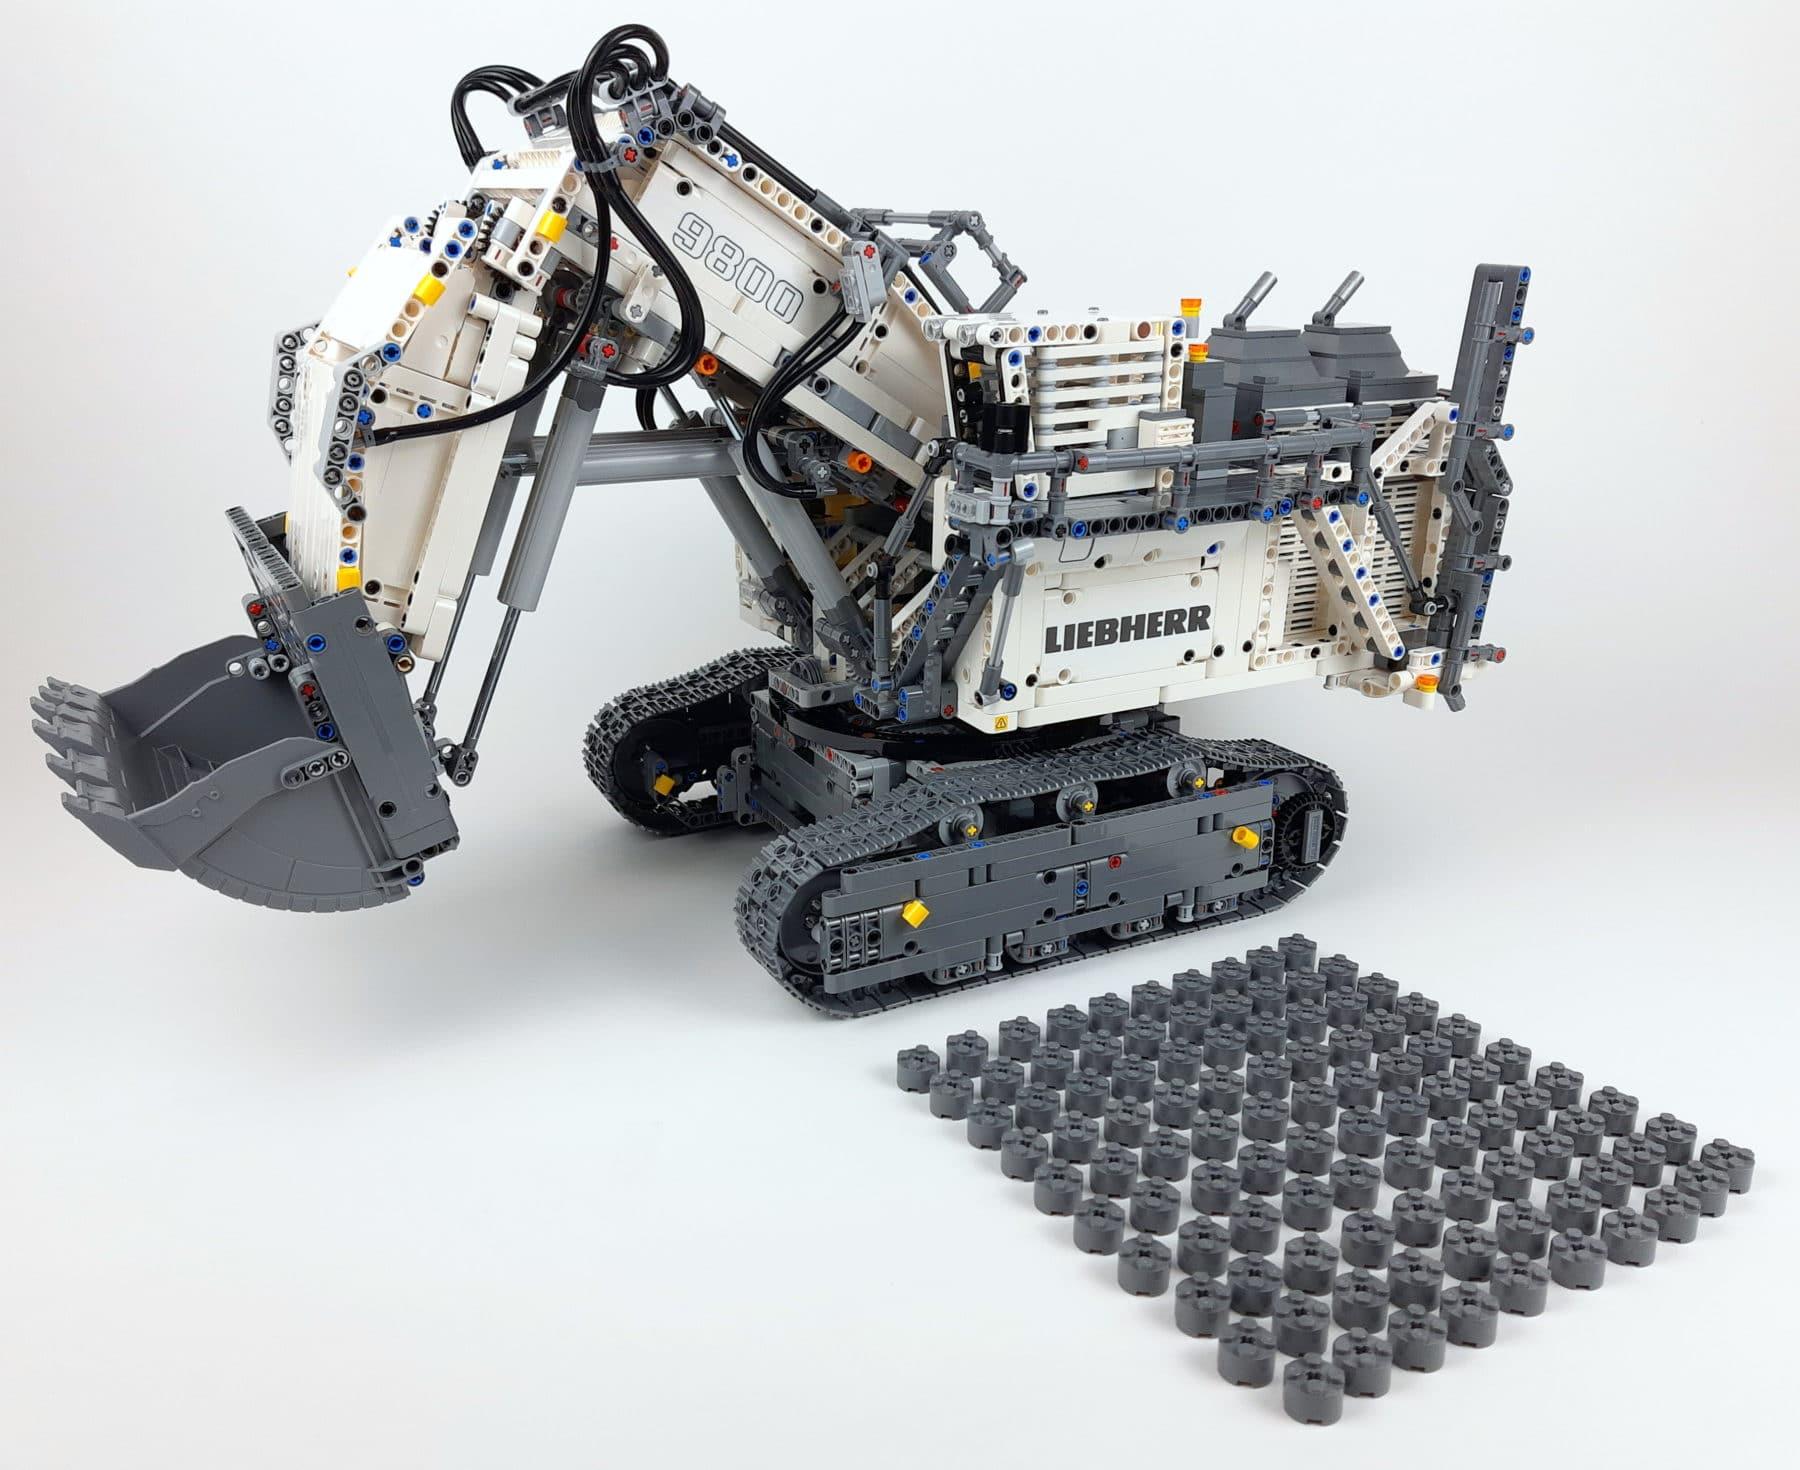 LEGO Technic 42100 Liebherr R 9800: Bauabschnitt 6 fertig